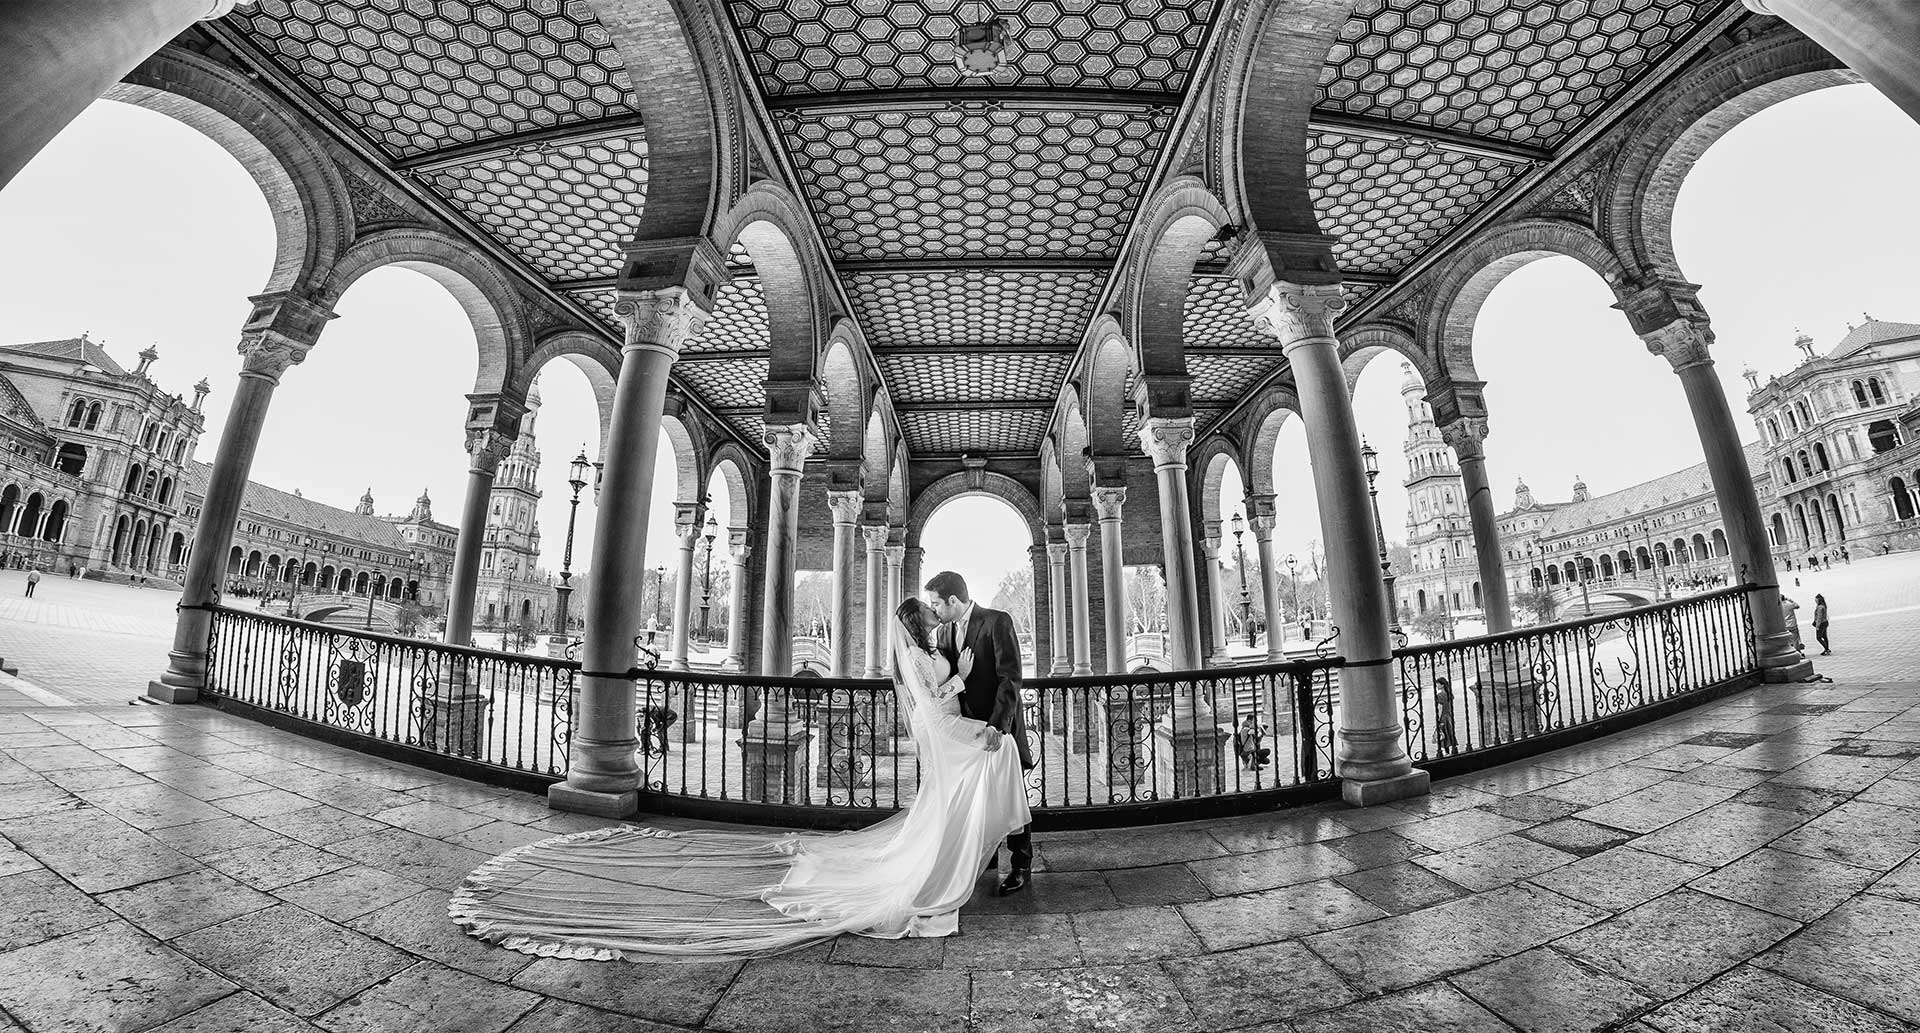 wedding-square-spain-seville